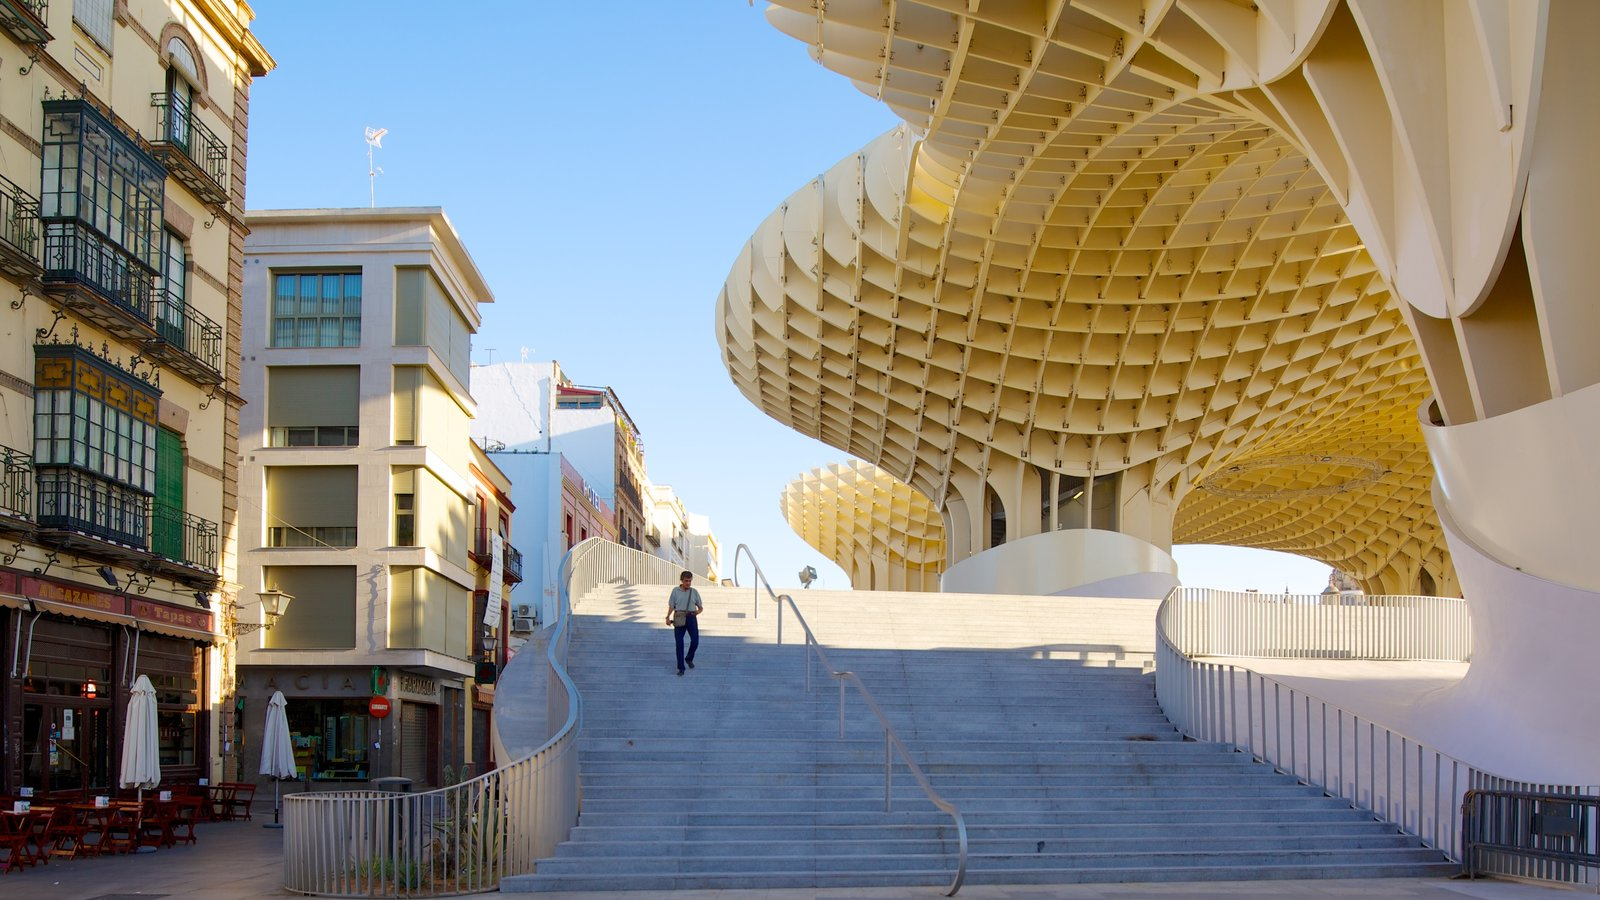 Modern Architecture City metropol parasol pictures: view photos & images of metropol parasol